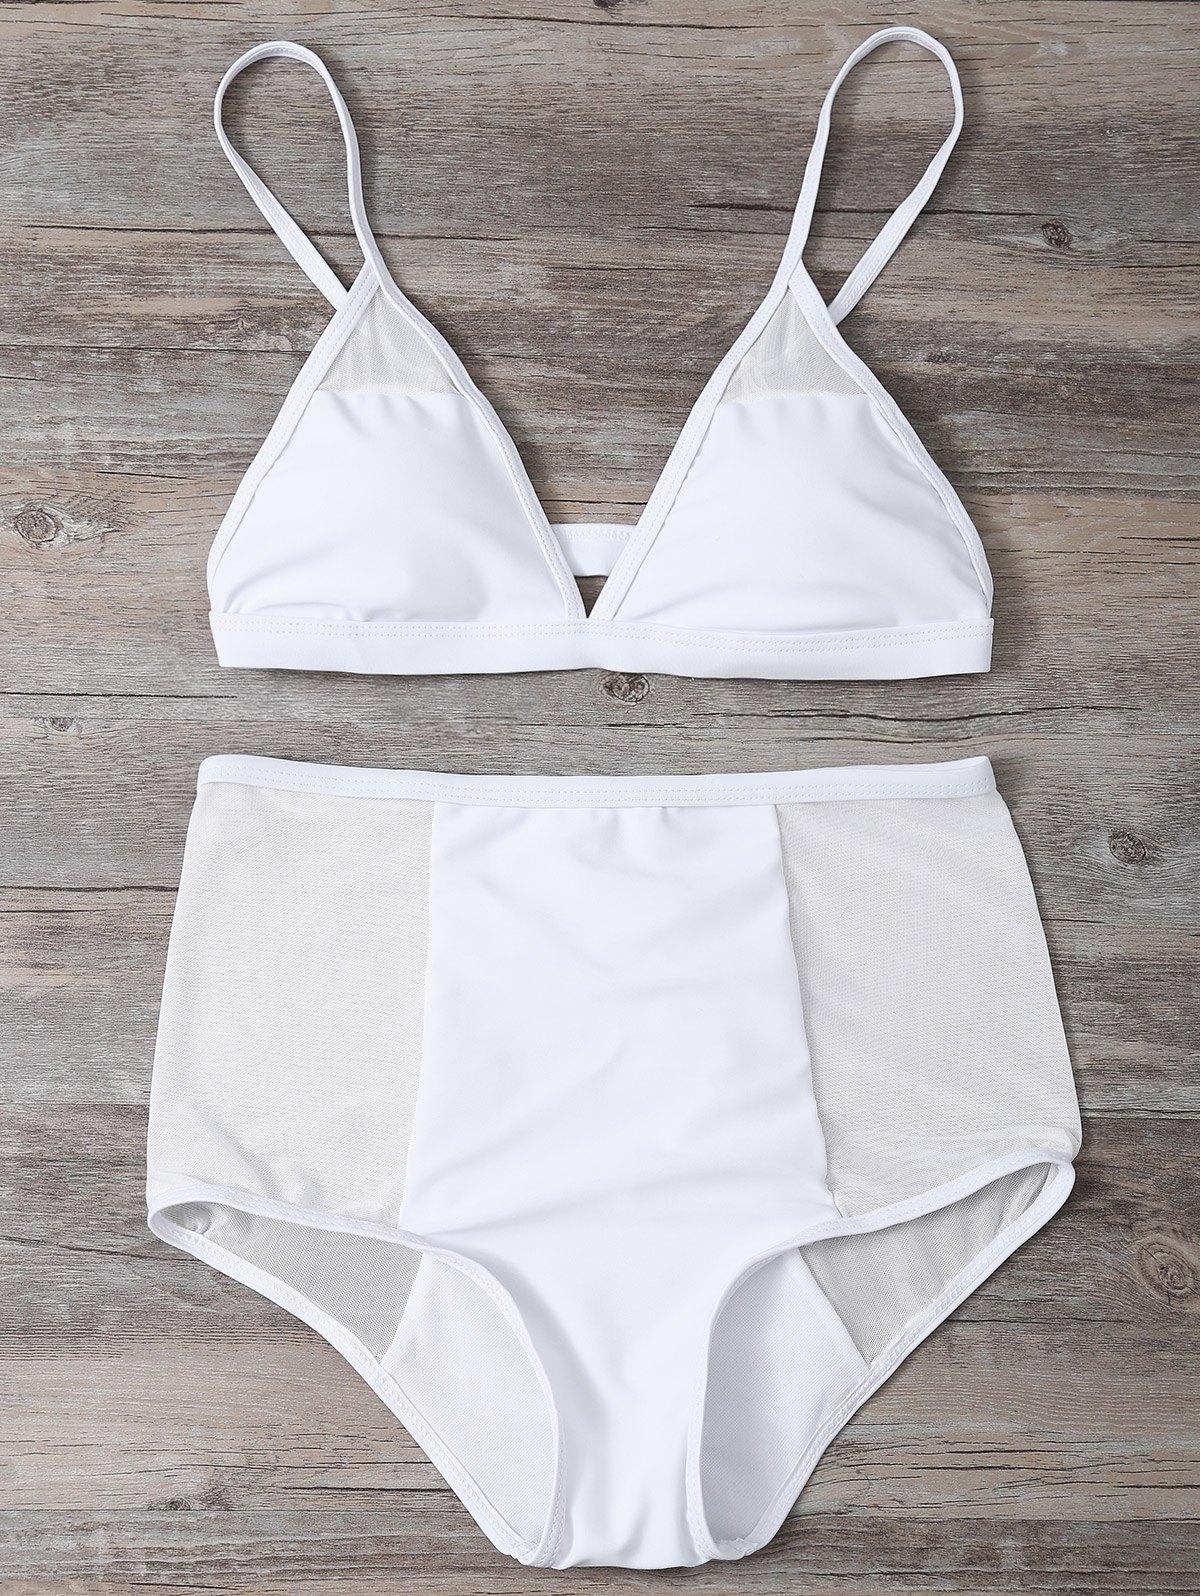 Sheer Low Cut High Waist Bikini Set